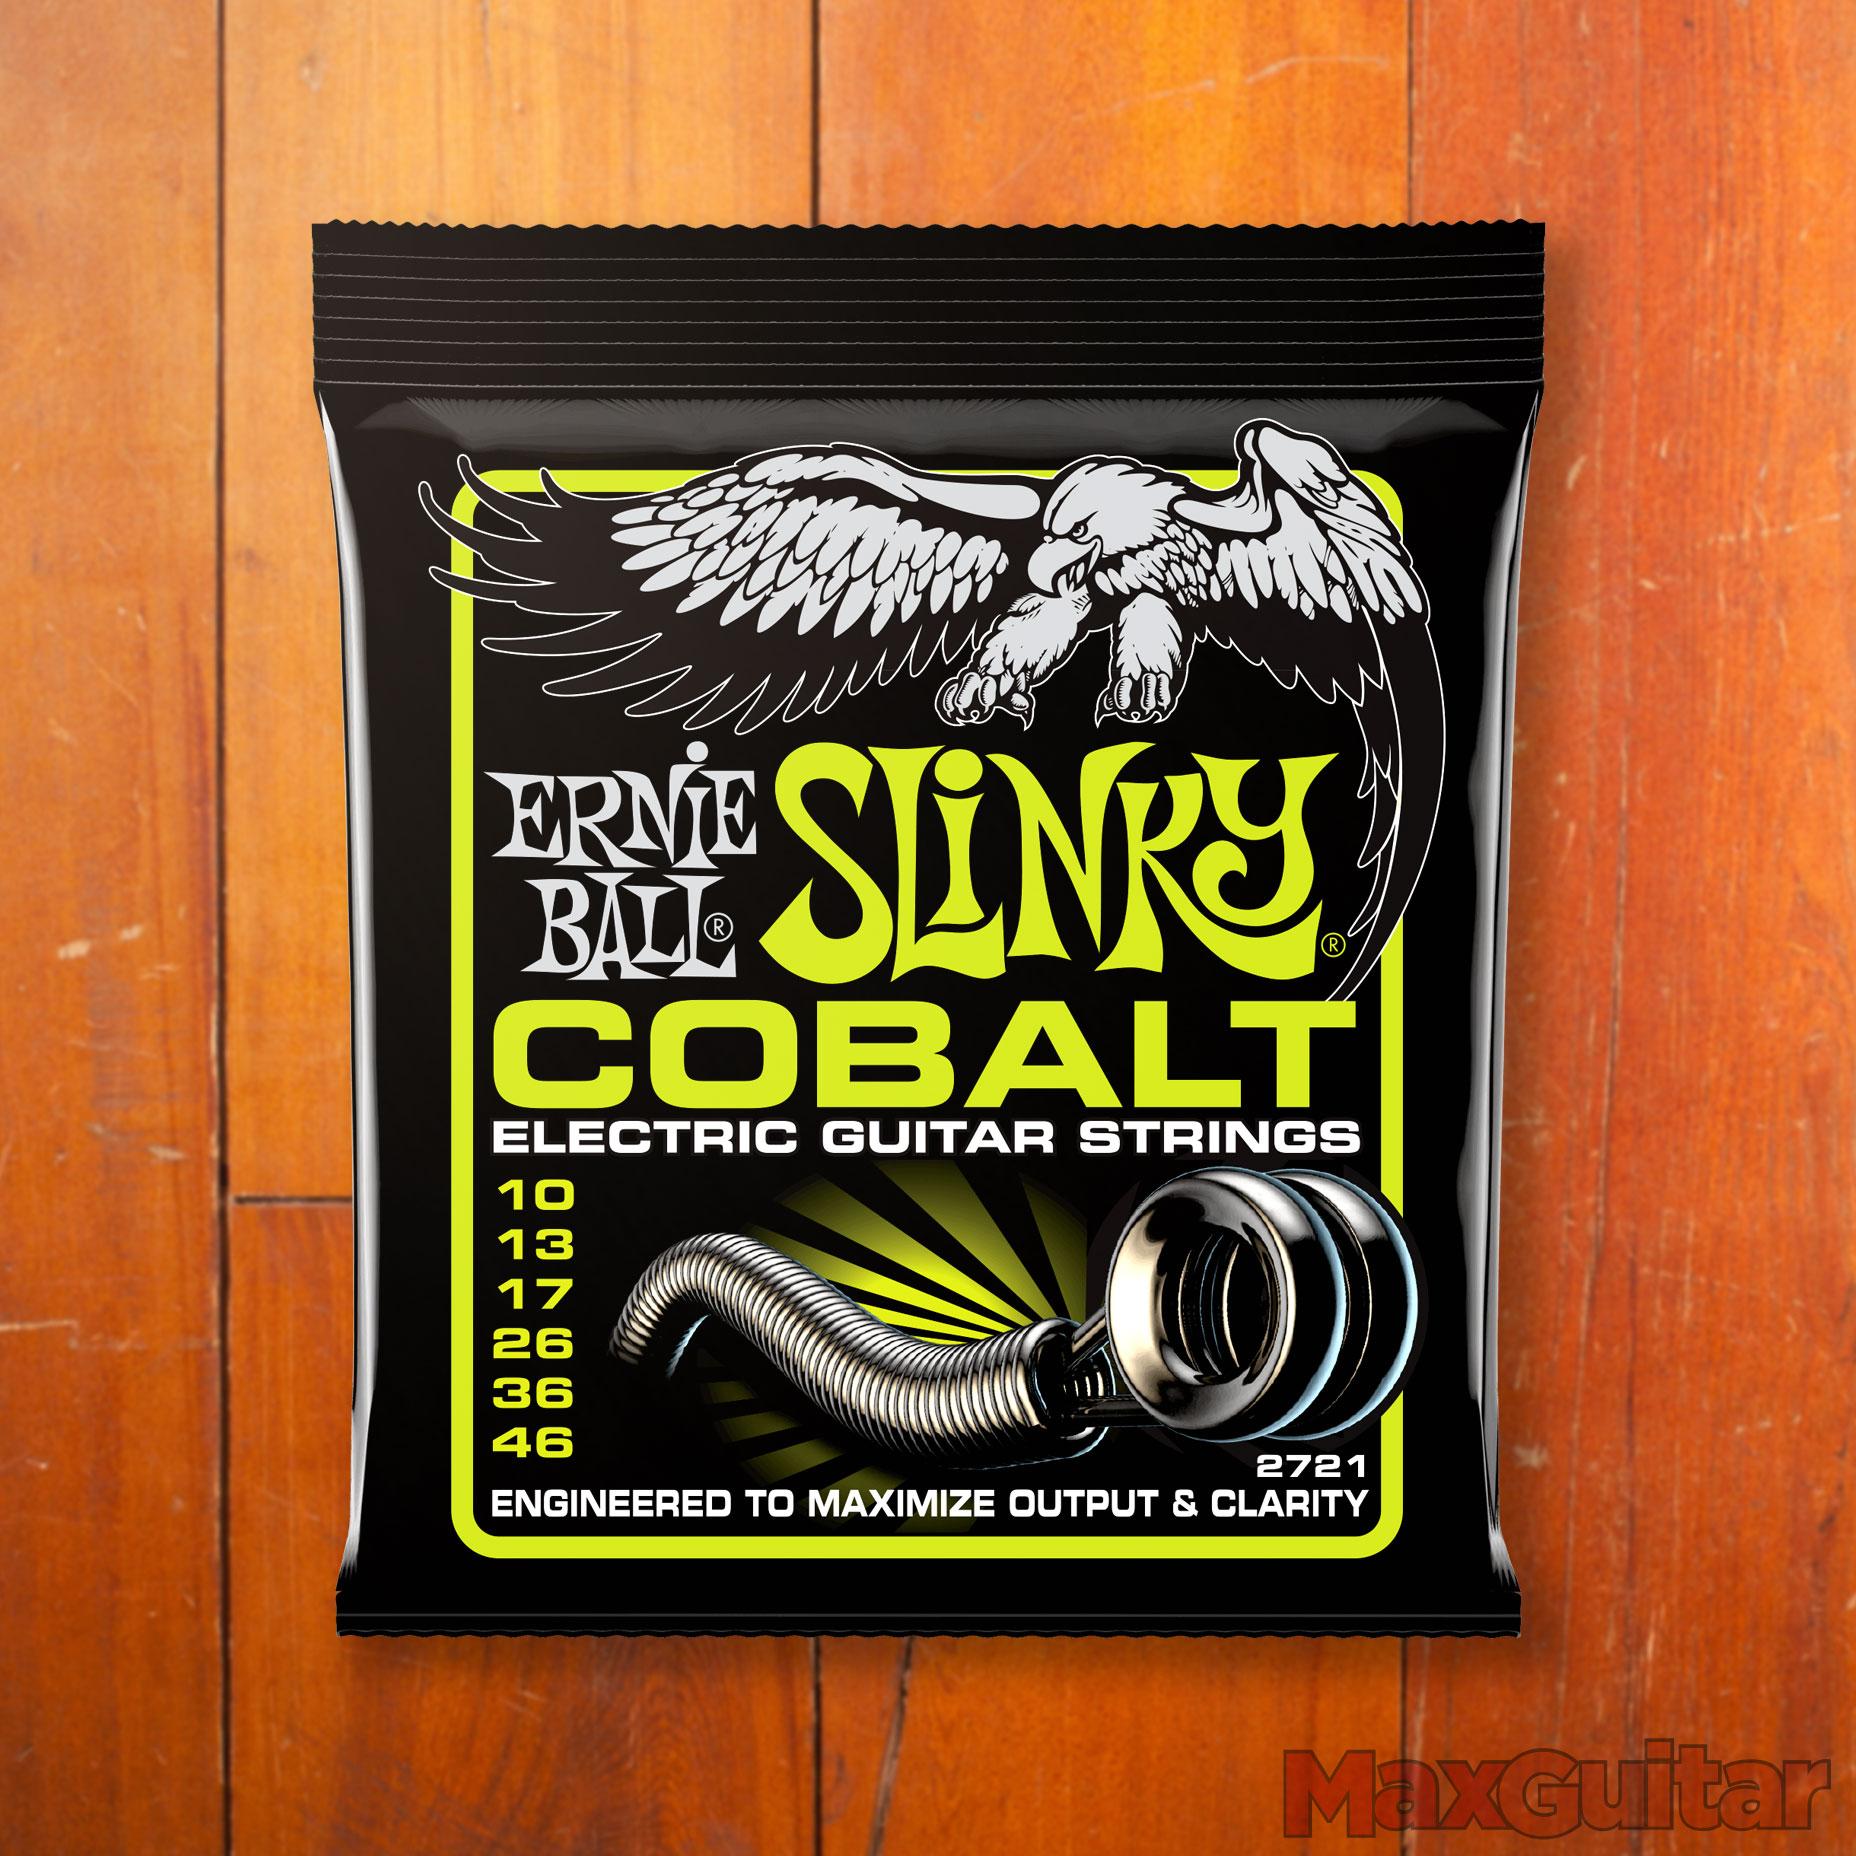 Ernie Ball 2721 Cobalt Regular Slinky elektrische gitaarsnaren